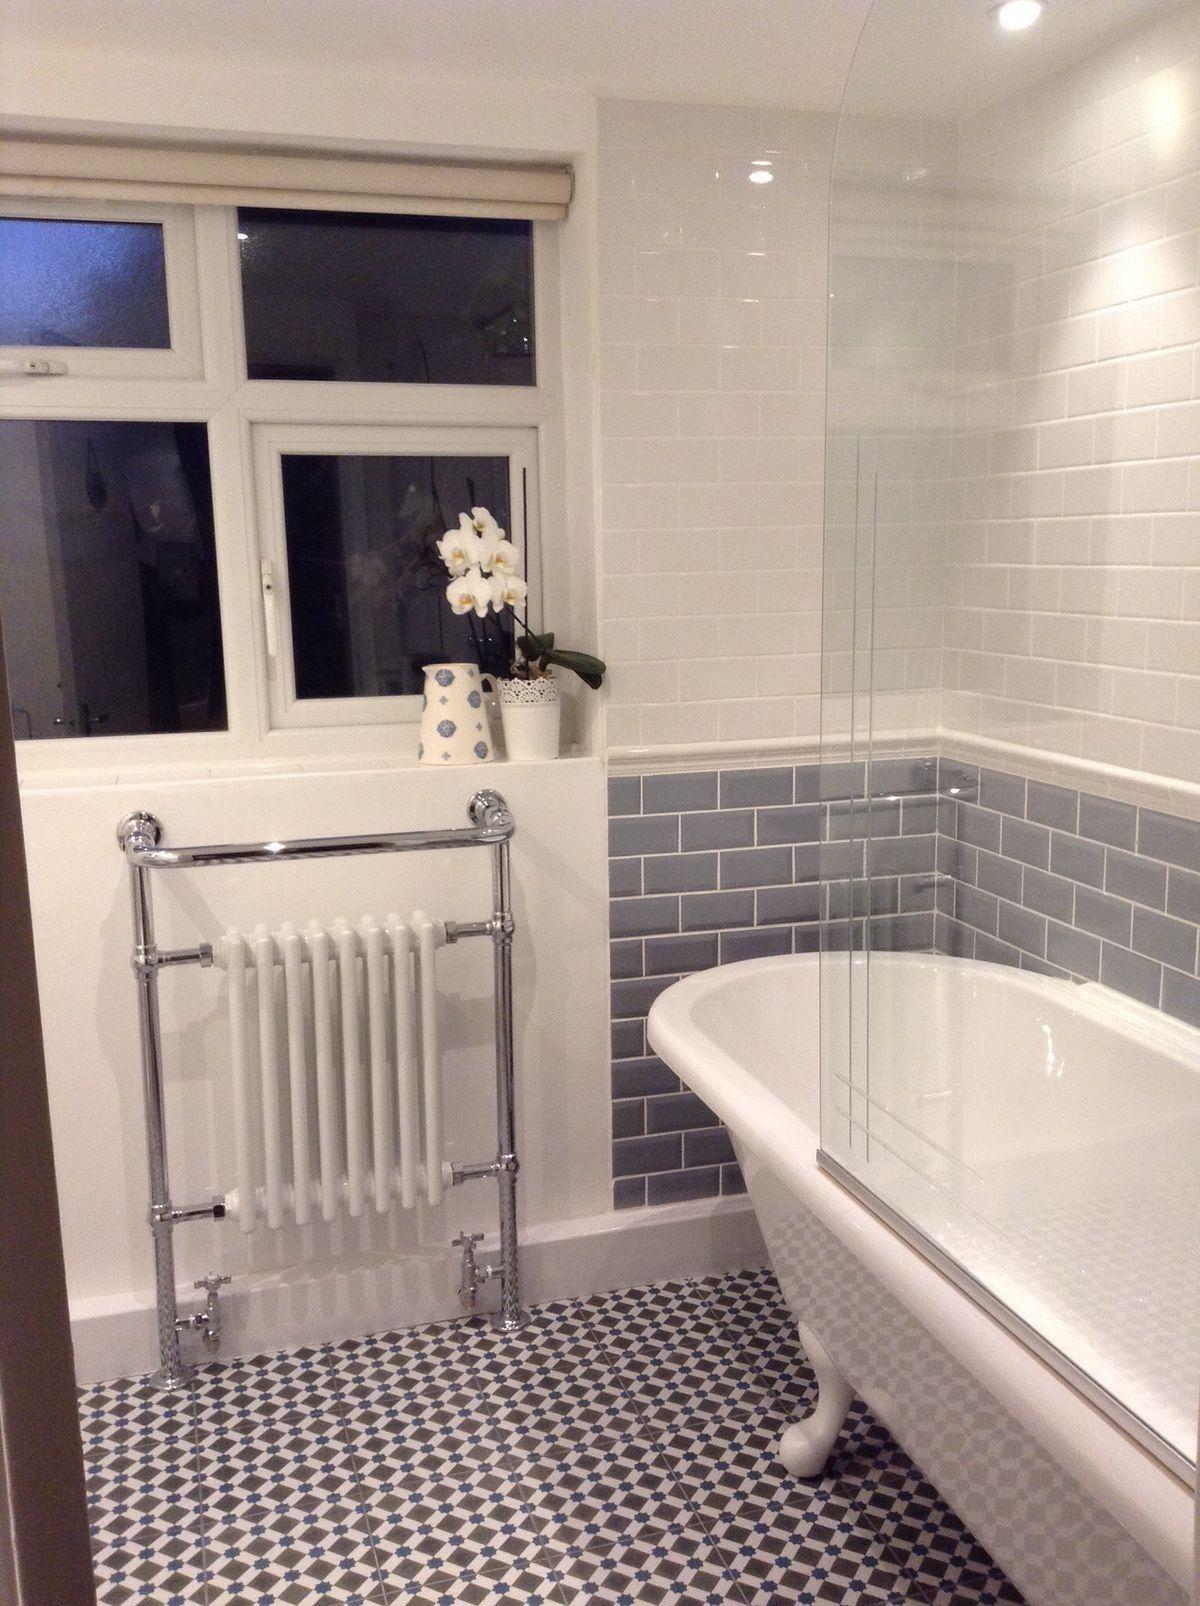 Badezimmer design natur inspiriert pin by christina de la toba on bathroomus in   pinterest